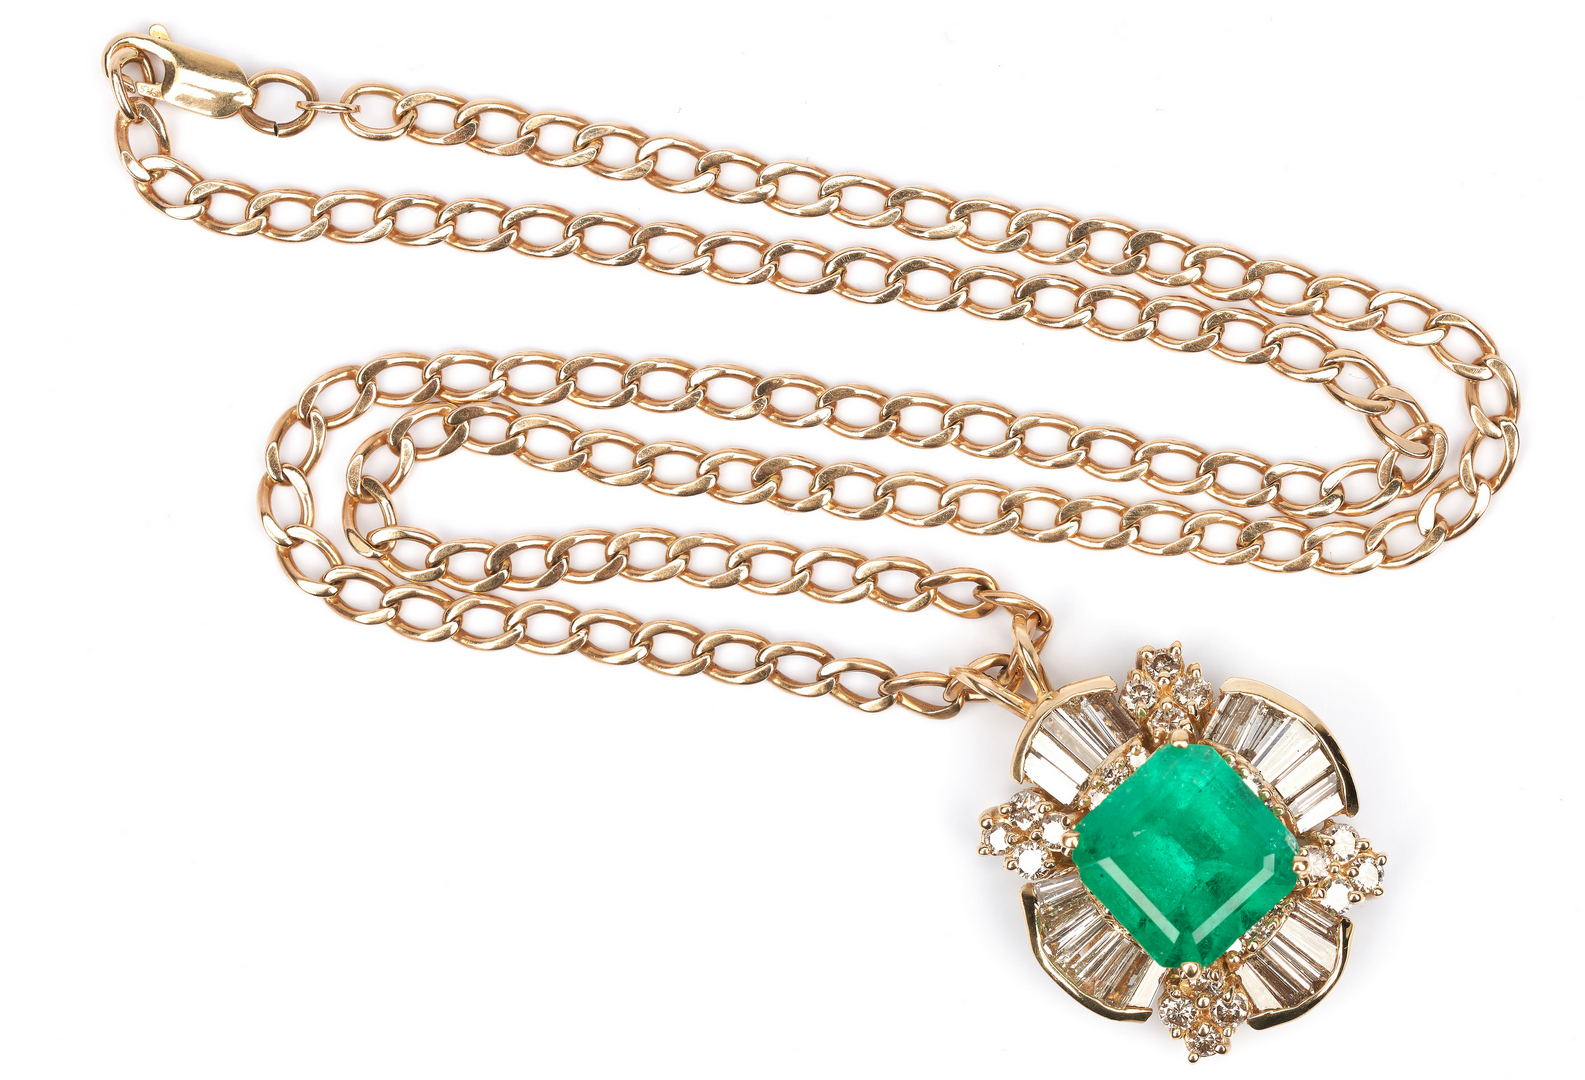 Lot 27: Ladies 11K  Emerald, Gold, & Diamond Pendant & Necklace